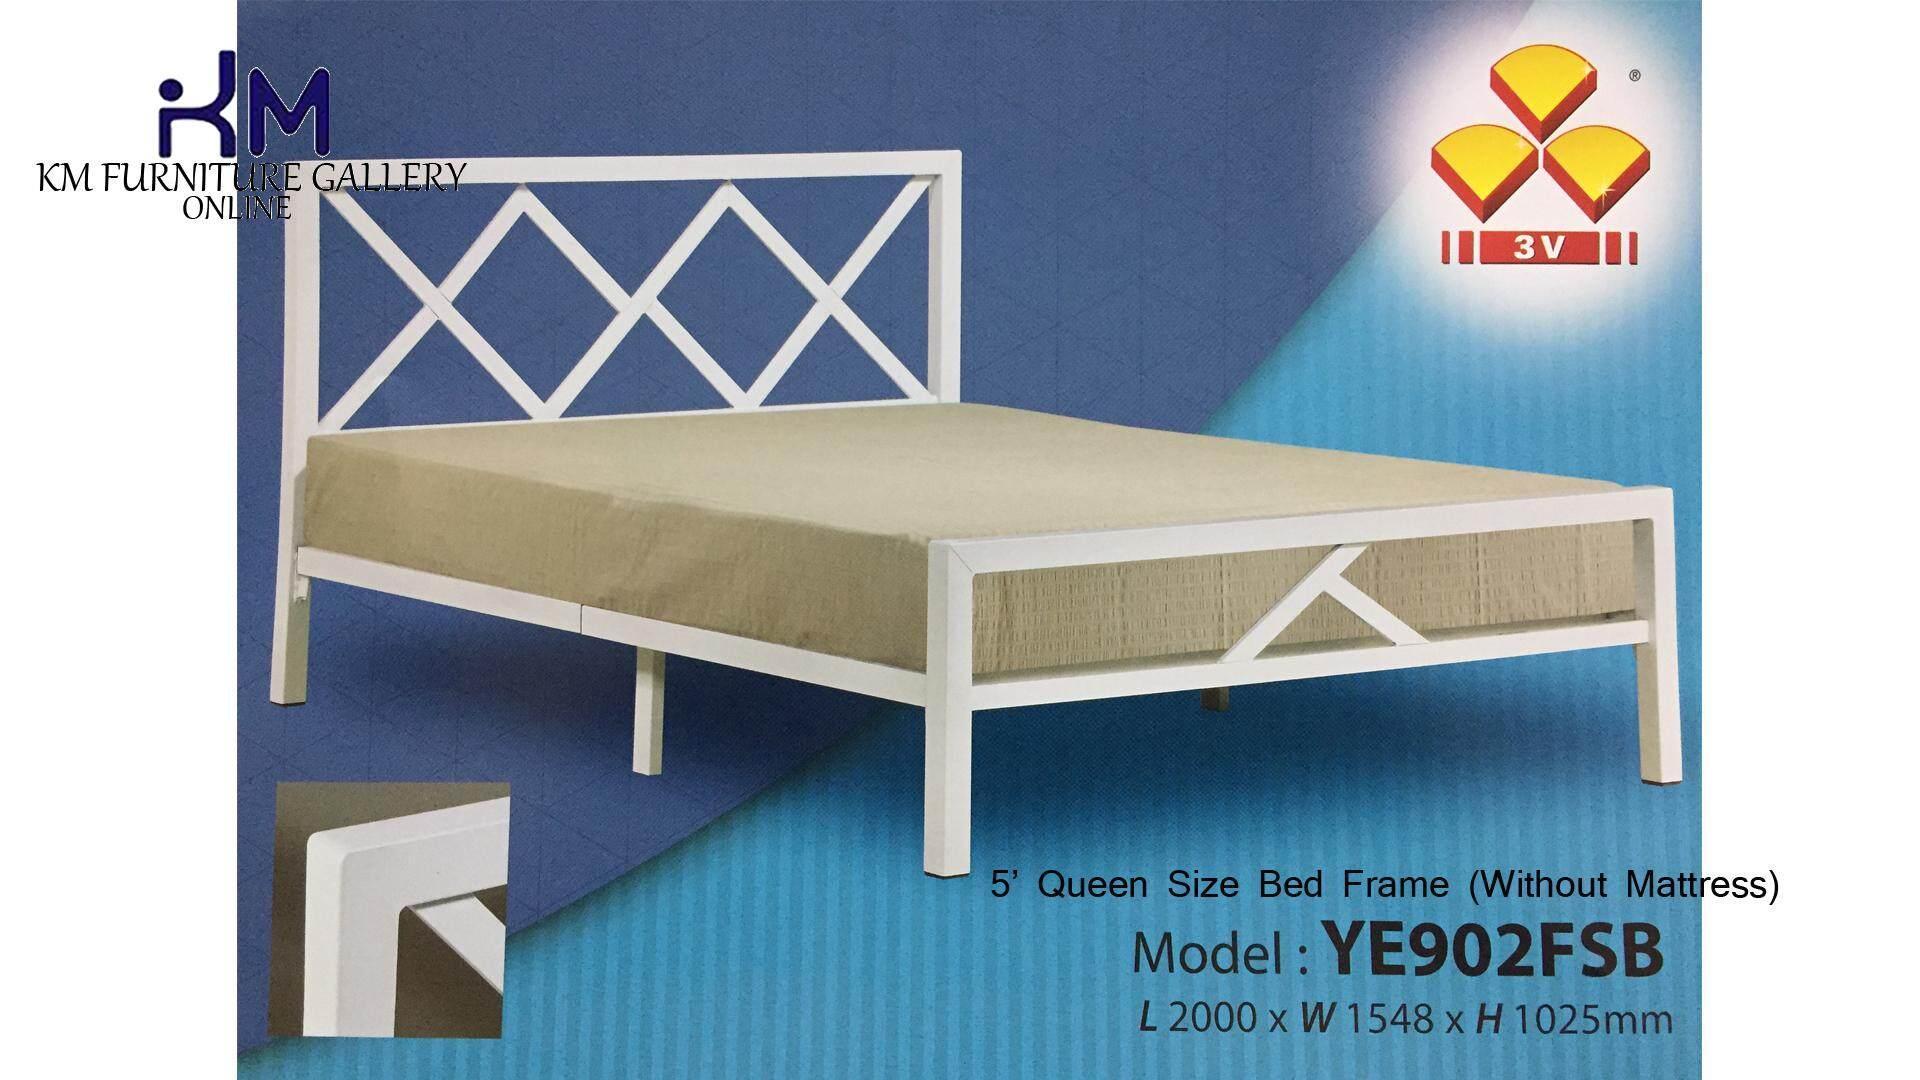 KM Furniture Gallery 3V Queen Metal Bed Frame Super Base (YE-902FSB) Without Mattress / Katil Queen Tiada Termasuk Tilam KMYE902FSB